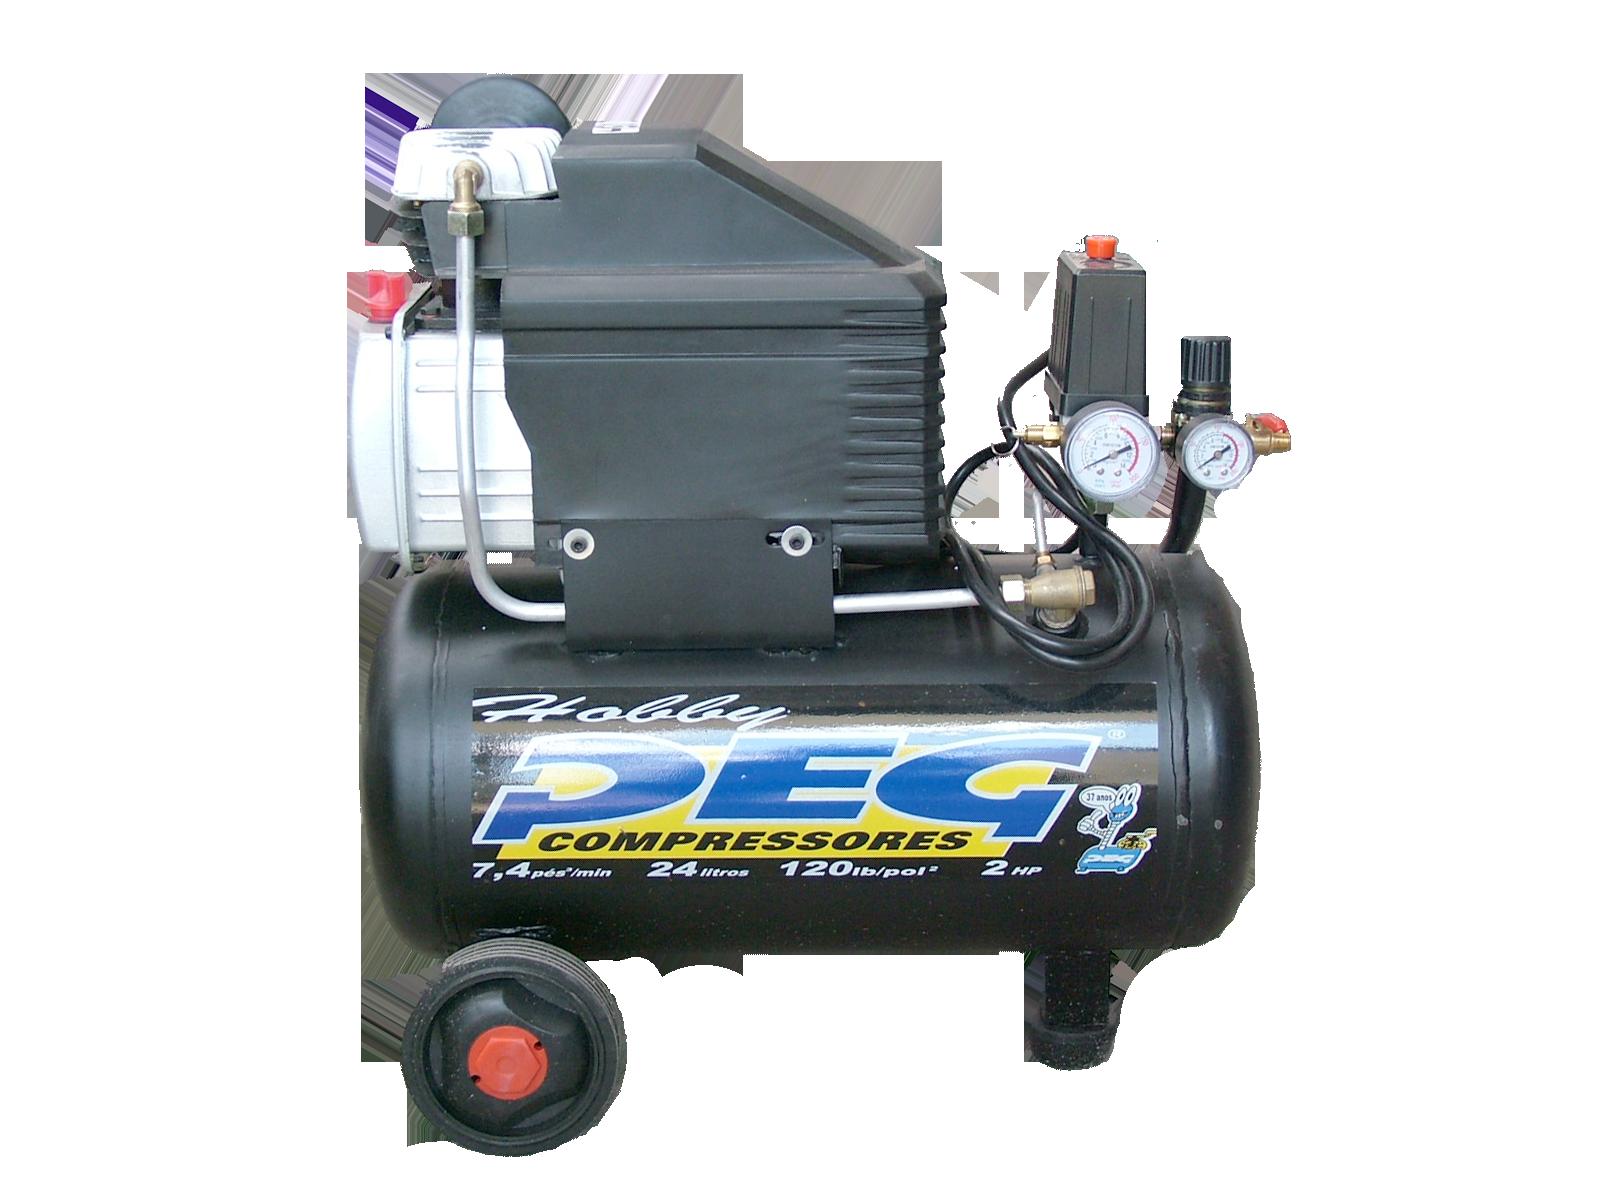 Compressor 7.4 - 24